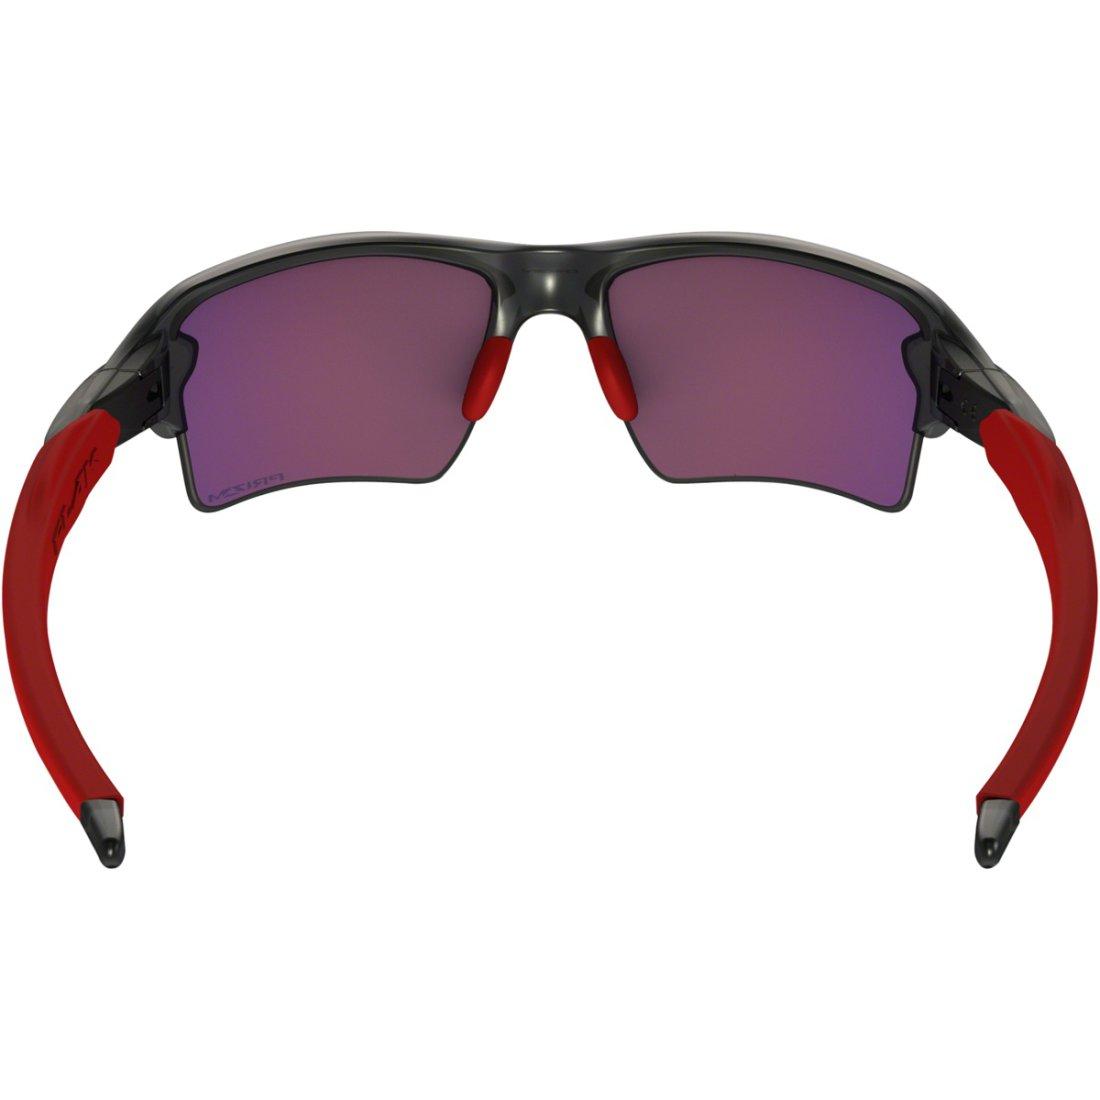 01dd67b29c Oakley Prizm Road Flak 2.0 Xl Sunglasses - Matte Grey Smoke prizm Road